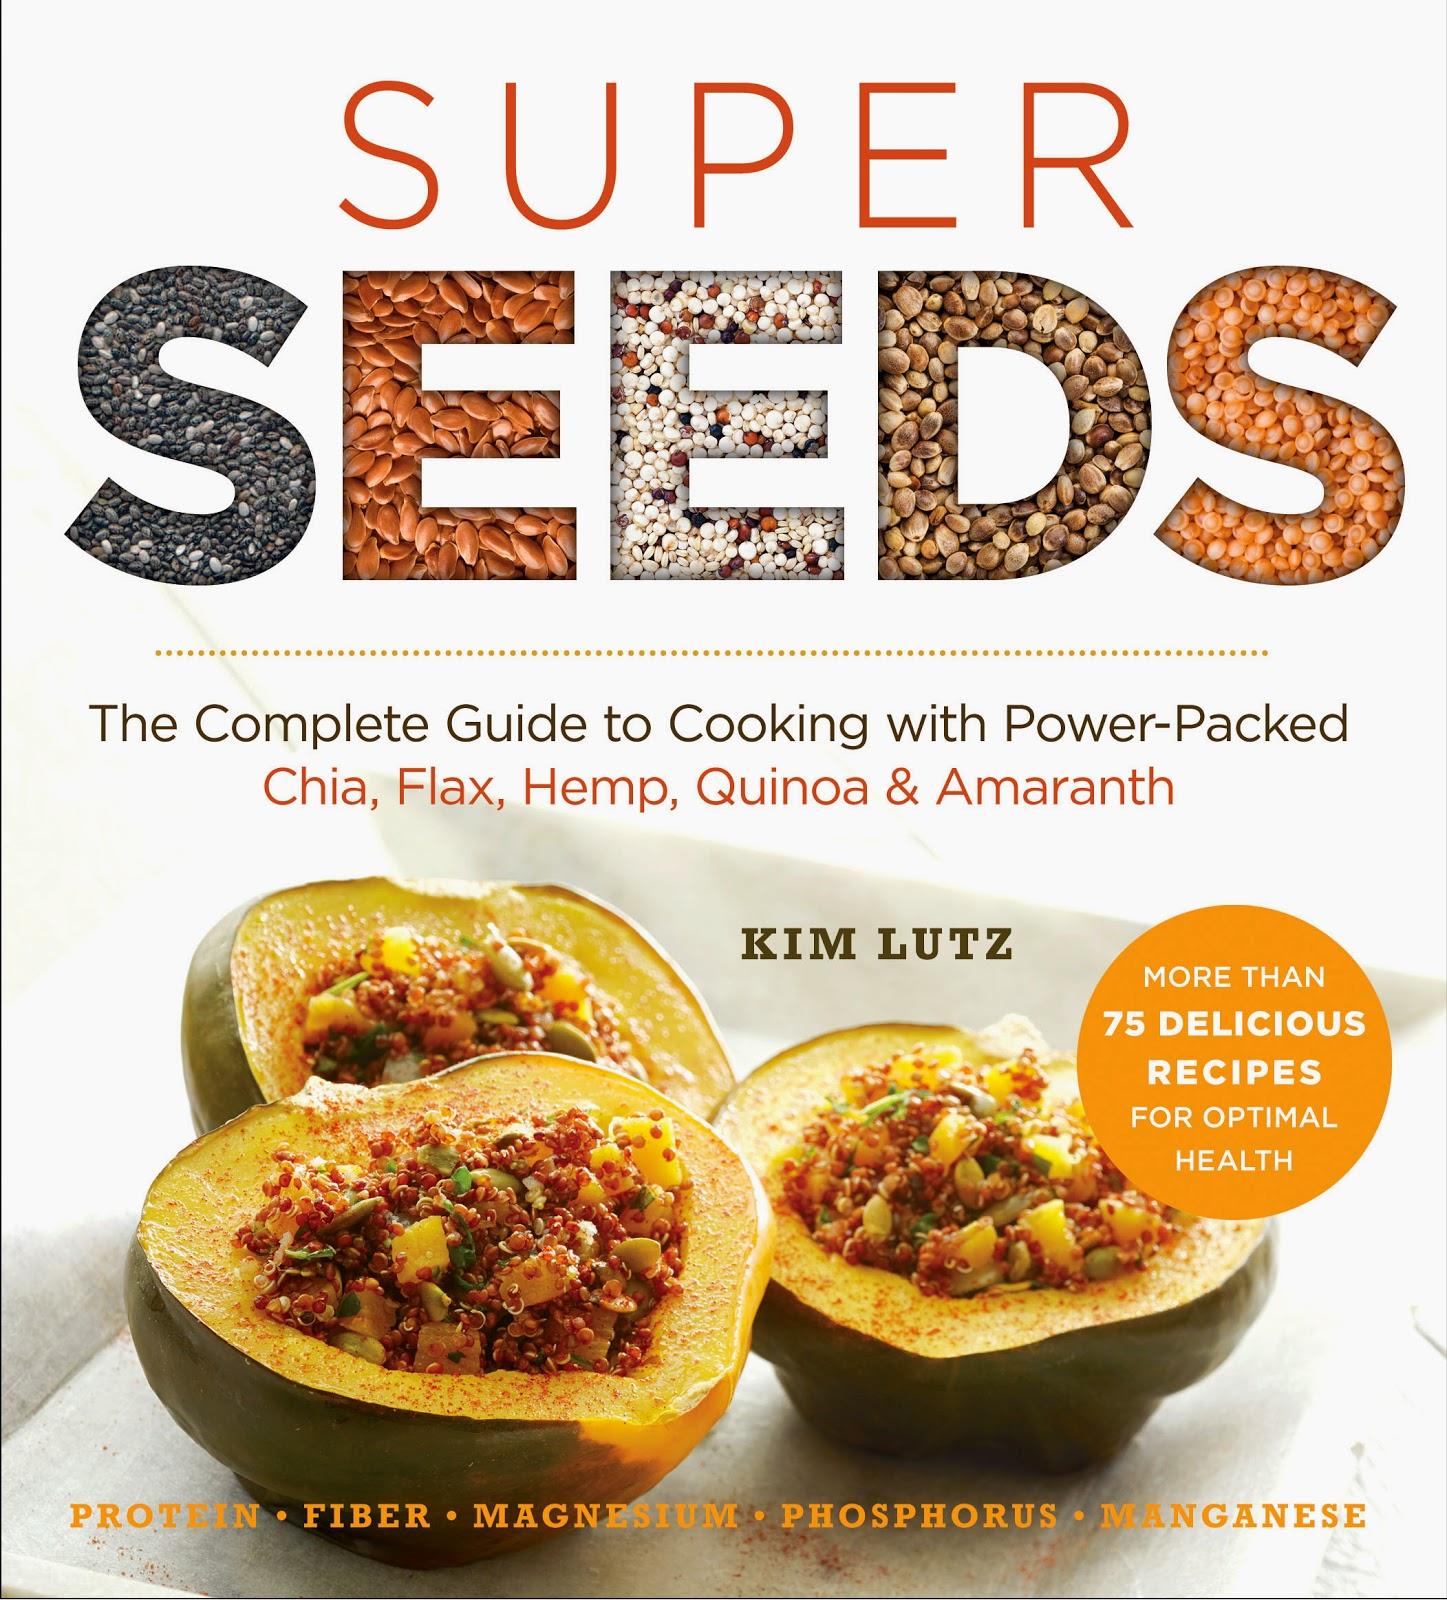 Super Seeds Recipe Roundup Too Giveaway!